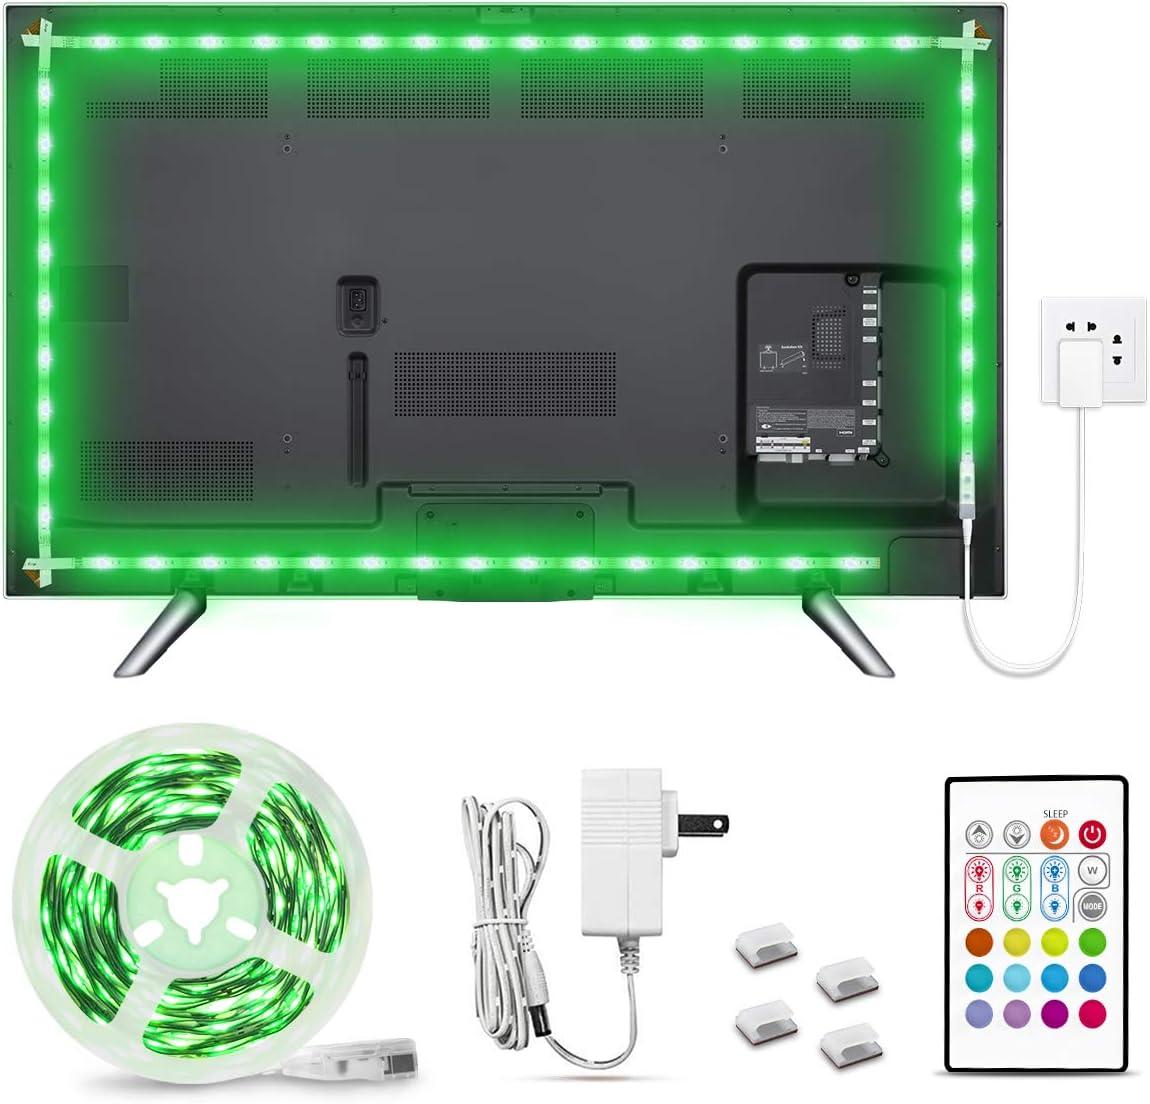 RGB TV Super intense SALE LED Backlight Finally resale start 18.37ft Bright Adhesive Stri SMD 5050 LEDs